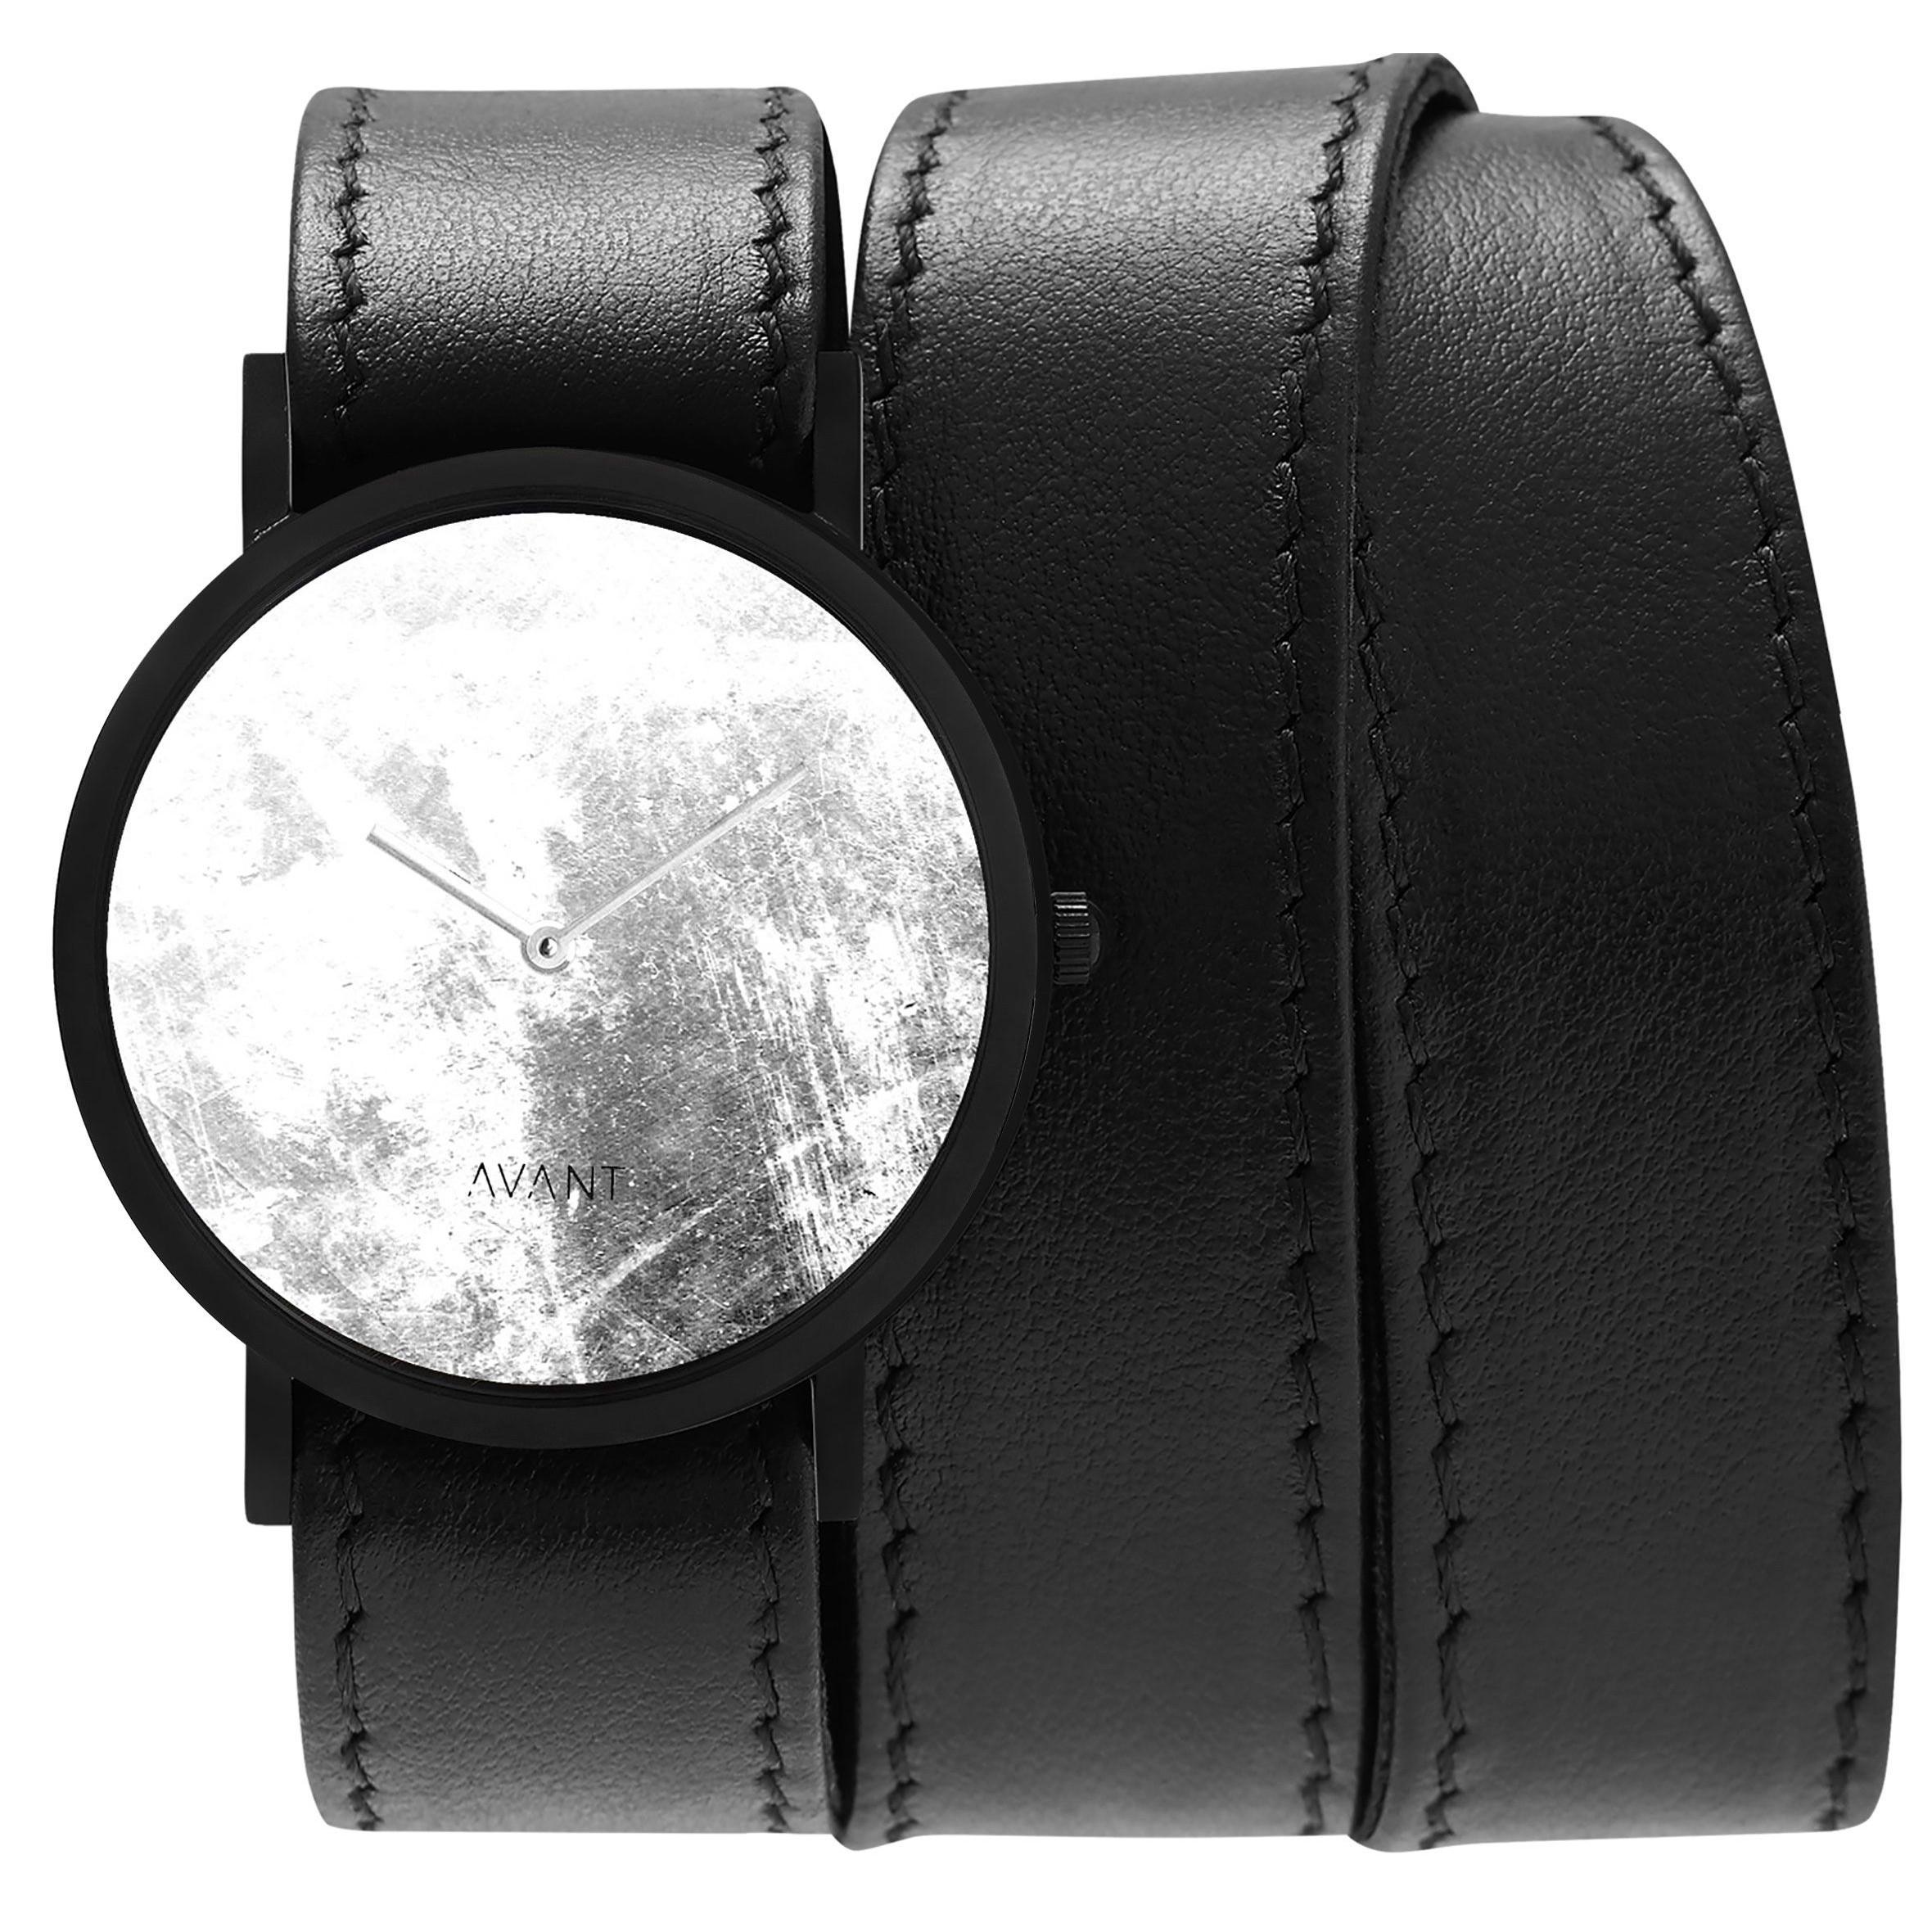 Avant Diffuse Triple Watch | Black & White